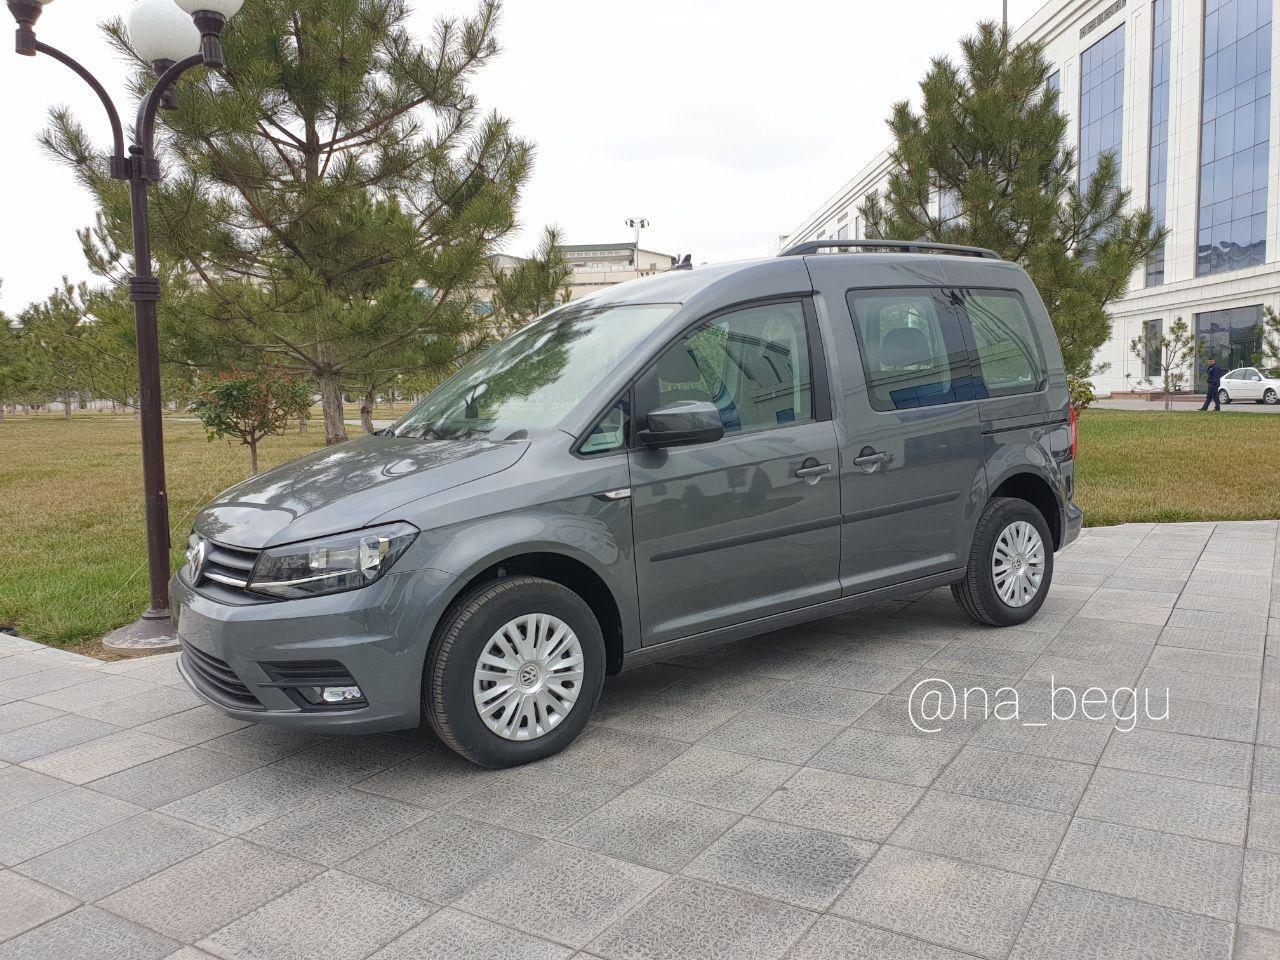 Volkswagen Caddy Narxi - Цена на Кэдди в Узбекистане - 14